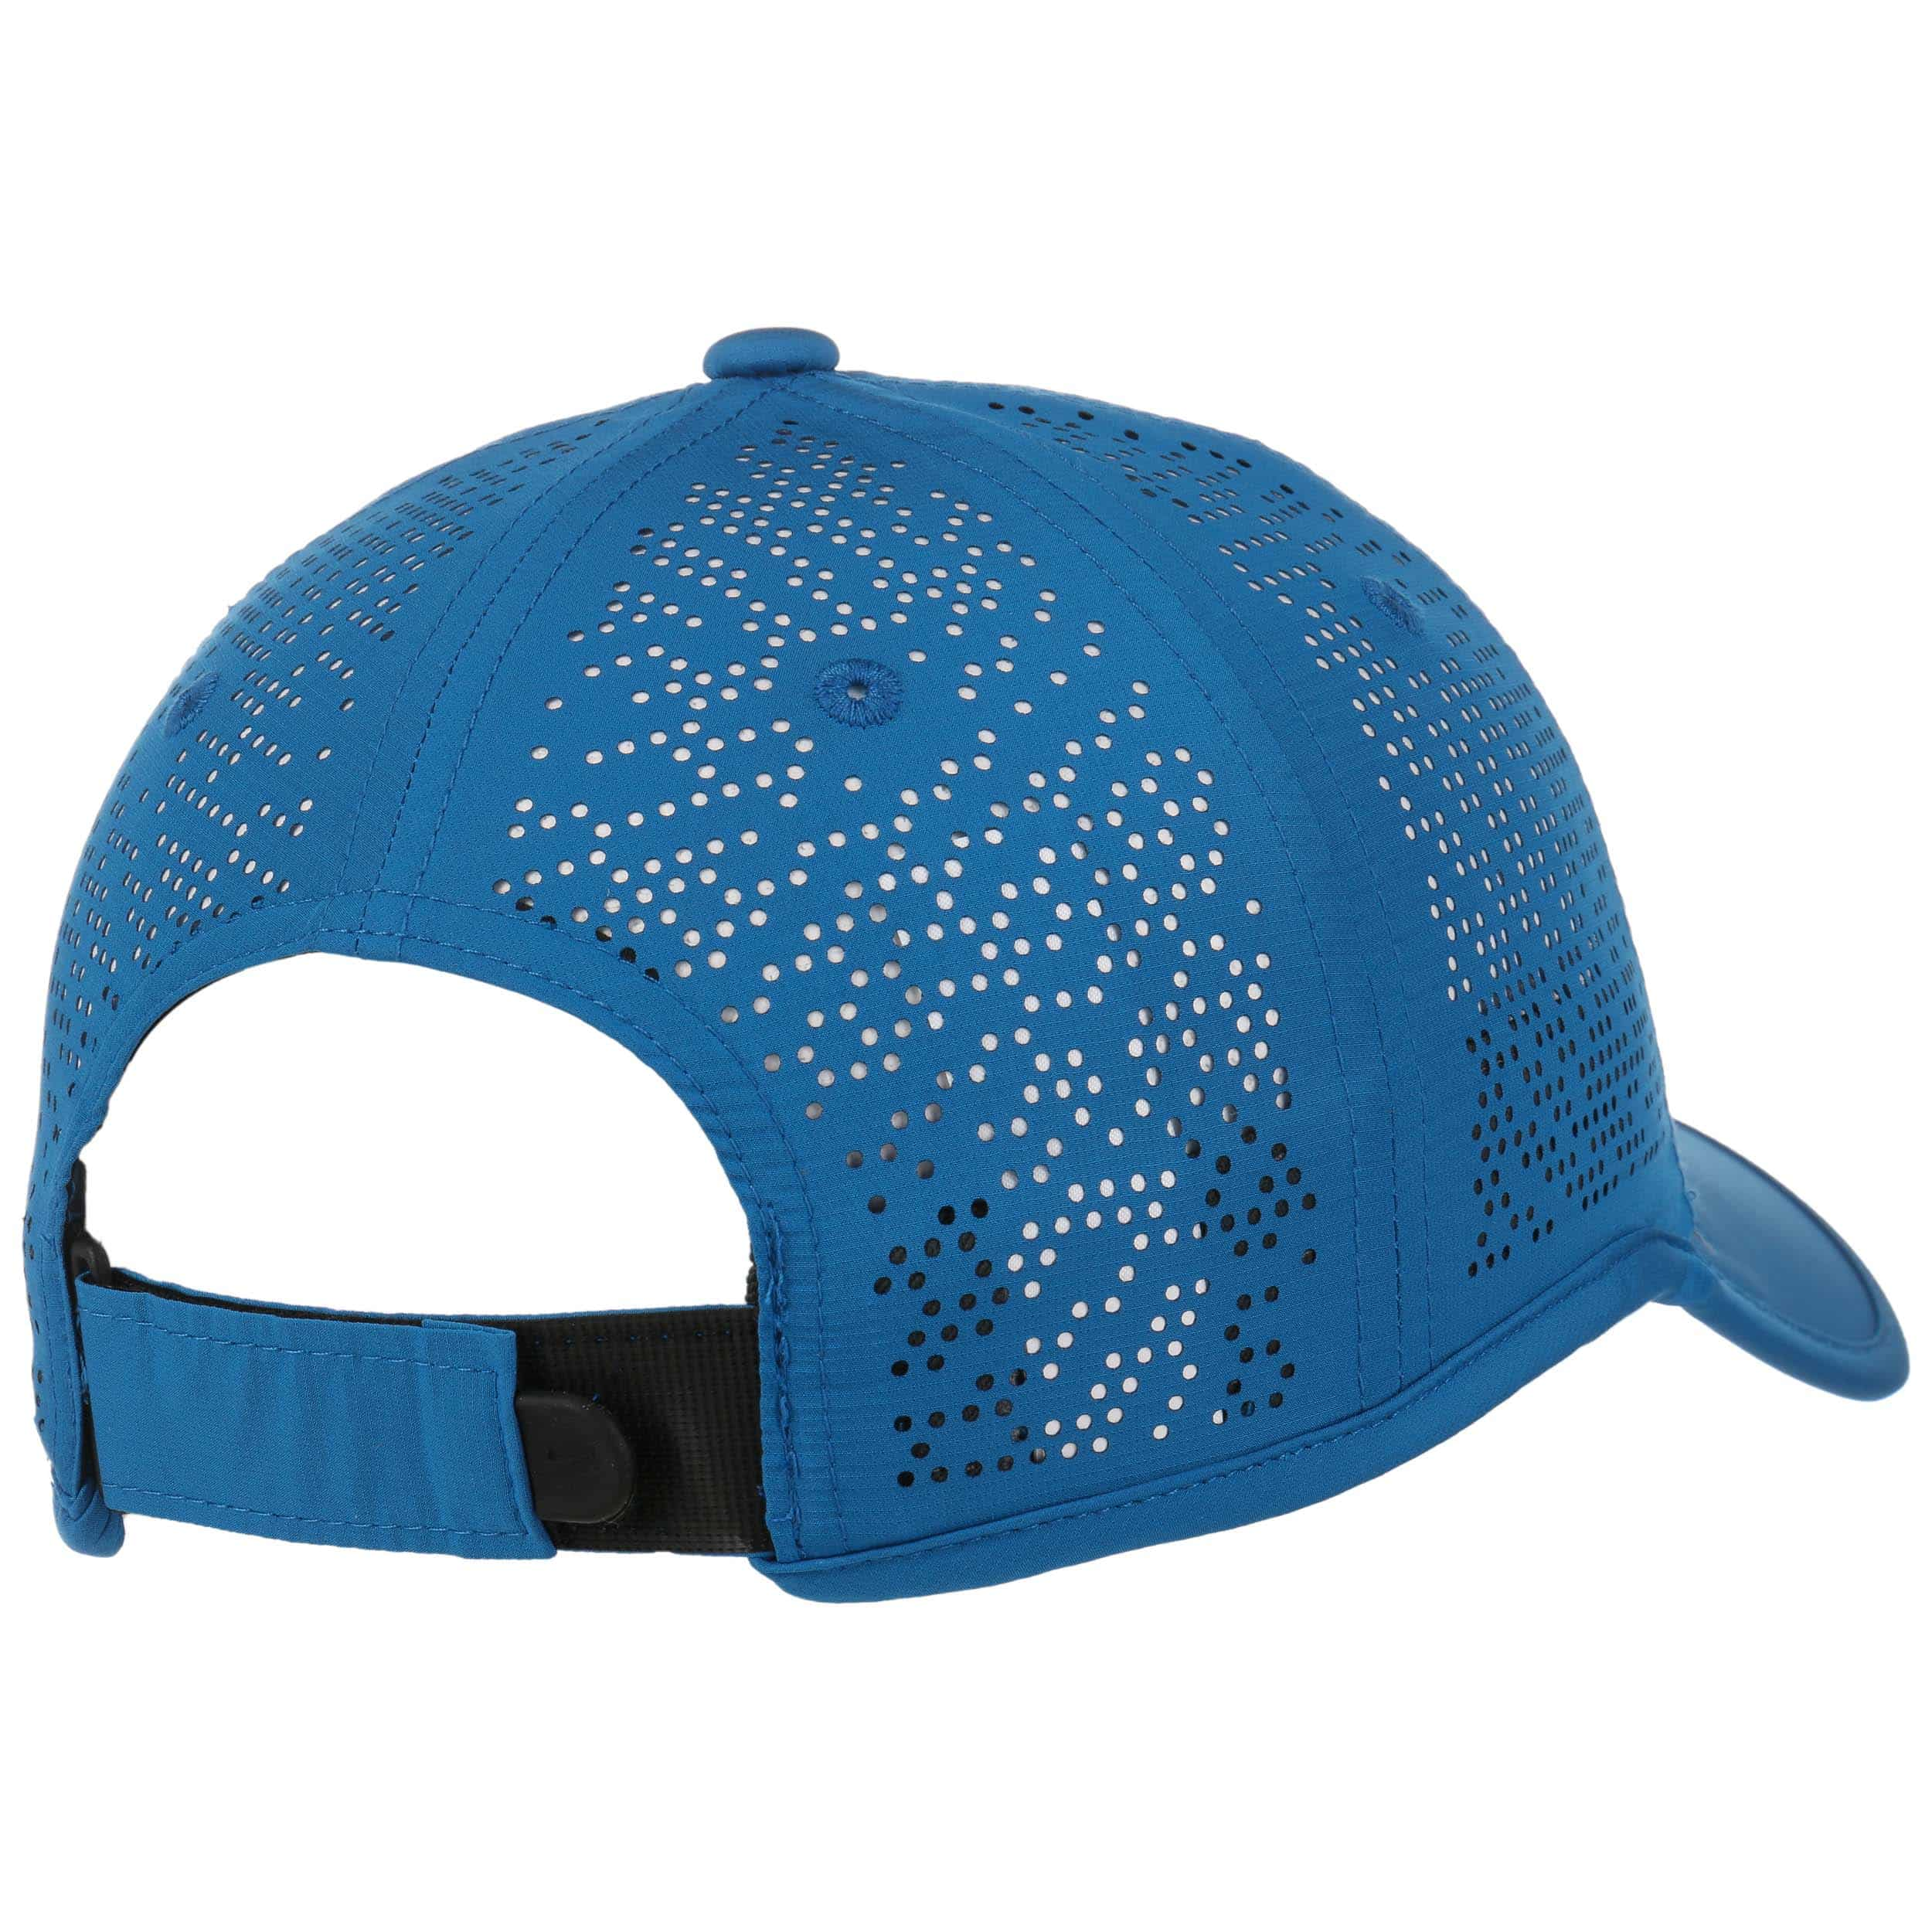 5ab1bb9865fb8 ... yellow 3 · Swoosh Perforation Cap by Nike - blue 3 ...